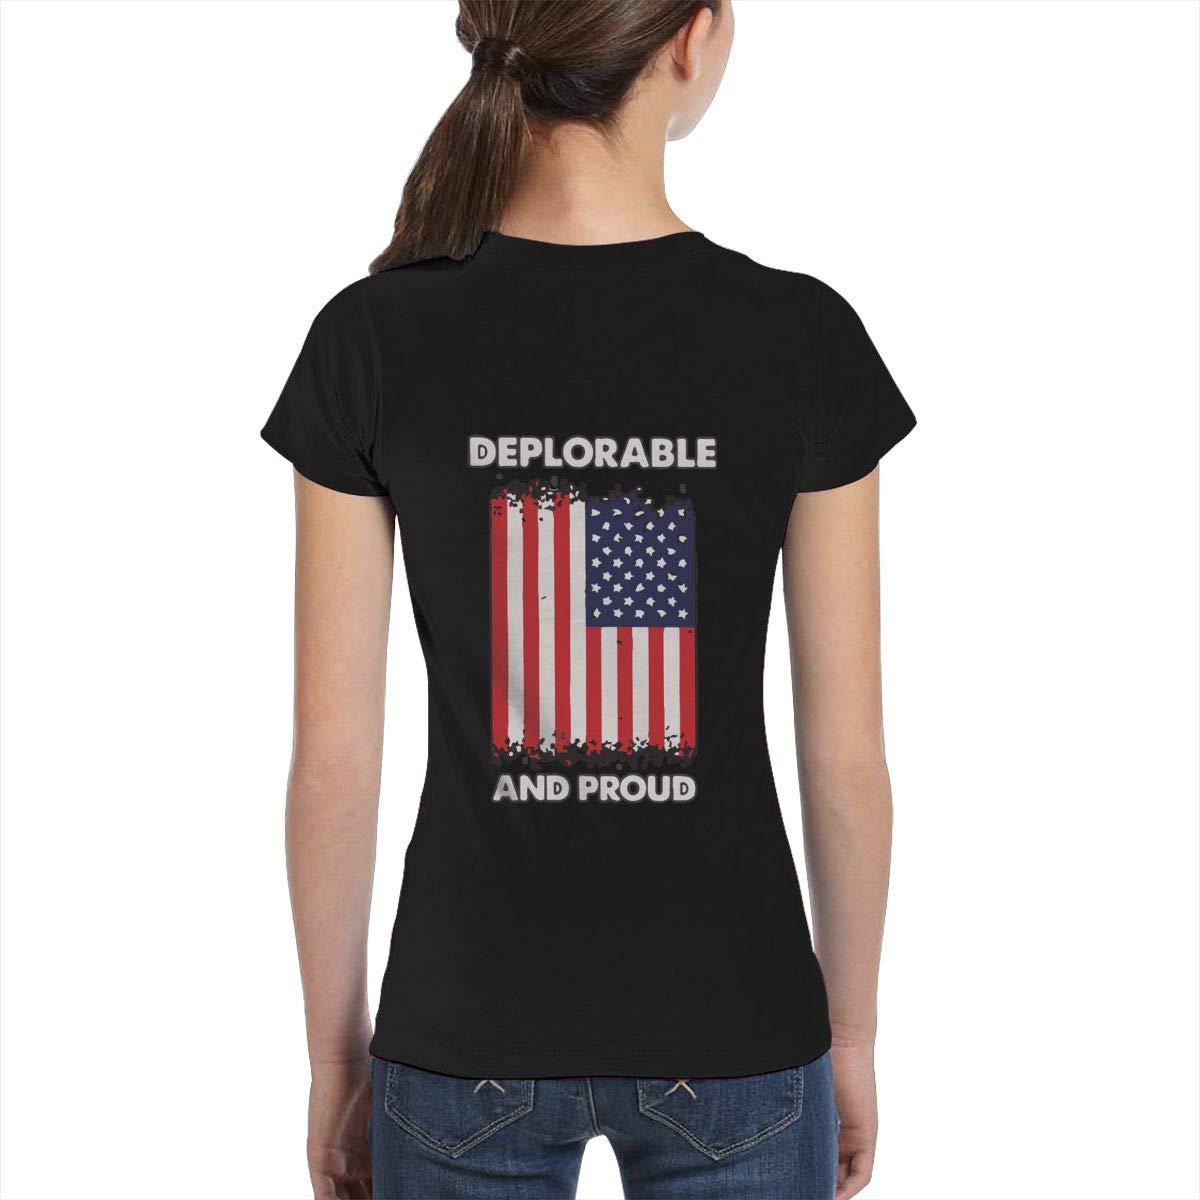 XS-XL Fashion Tunic Shirt Dress L6Nv4o@A Girls Short Sleeve Deplorable and Proud American Flag Shirts